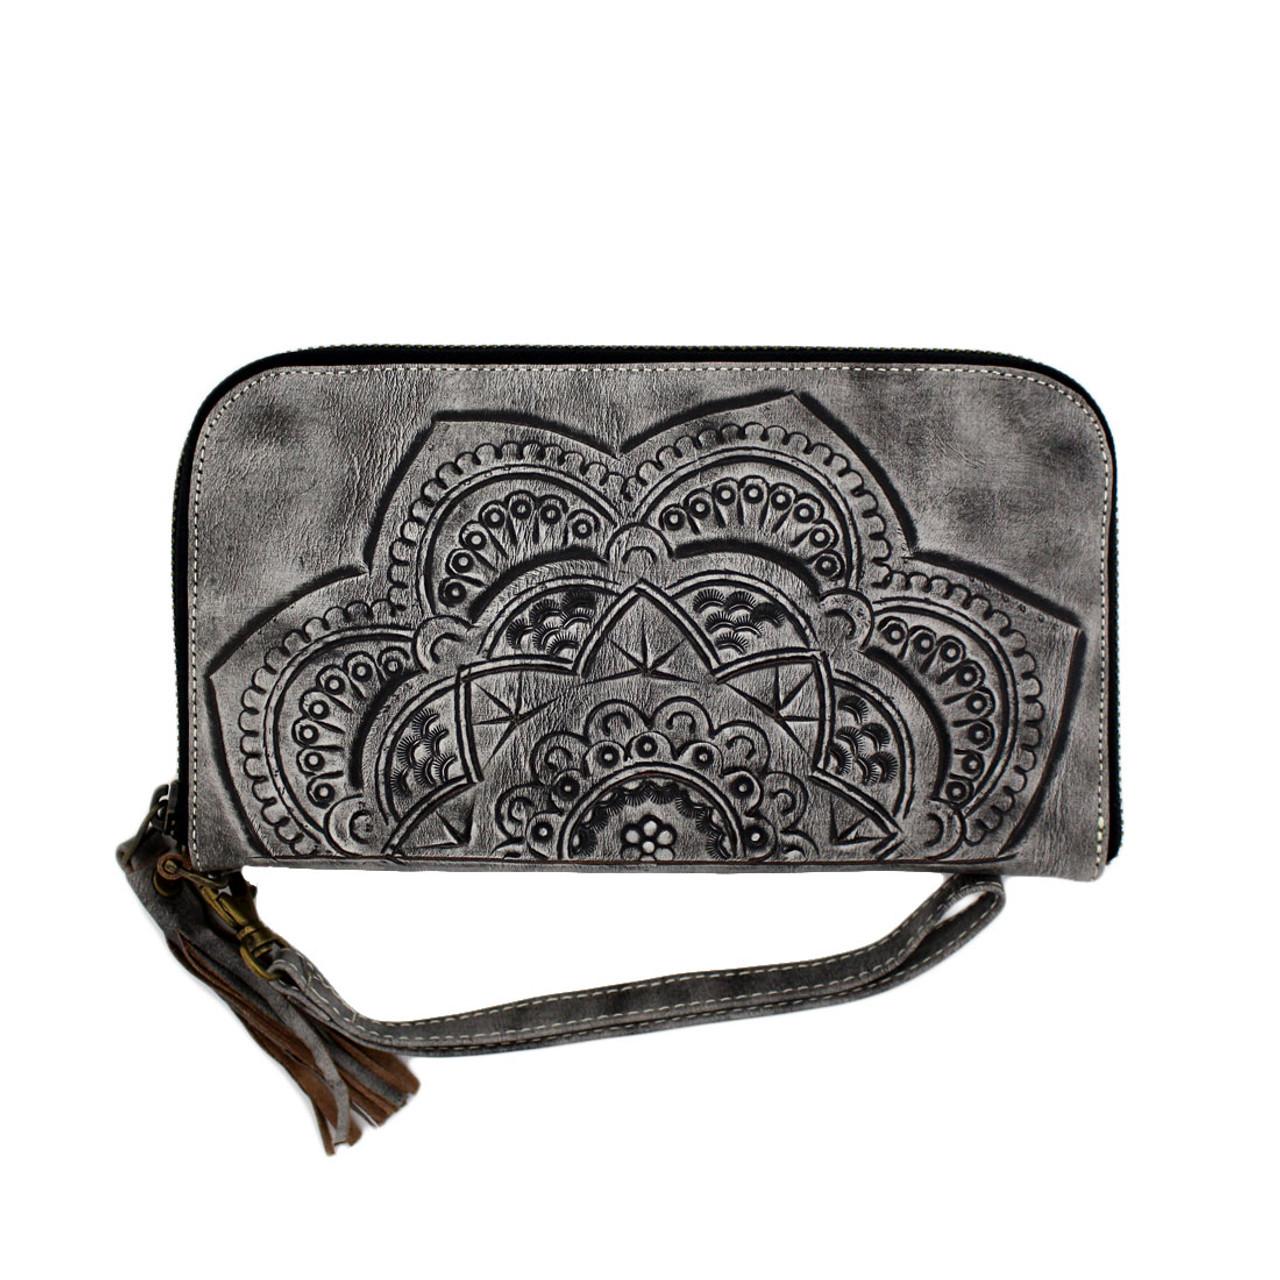 5fc8e5725027 Women's Genuine Leather Mandala Zip Around Wallet Wristlet